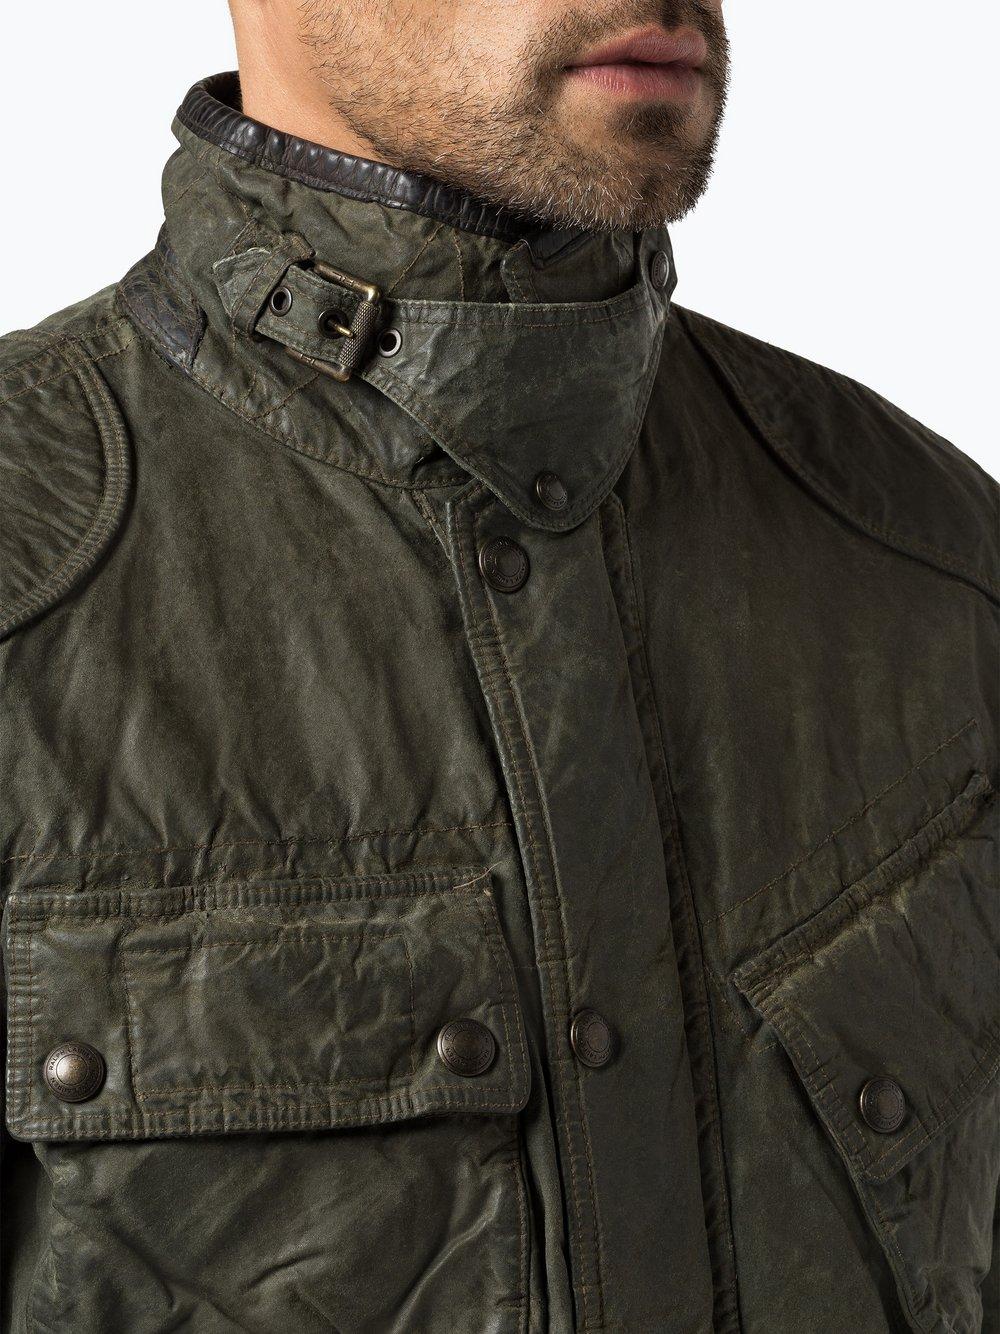 Polo Ralph Lauren Herren Jacke online kaufen | PEEK UND